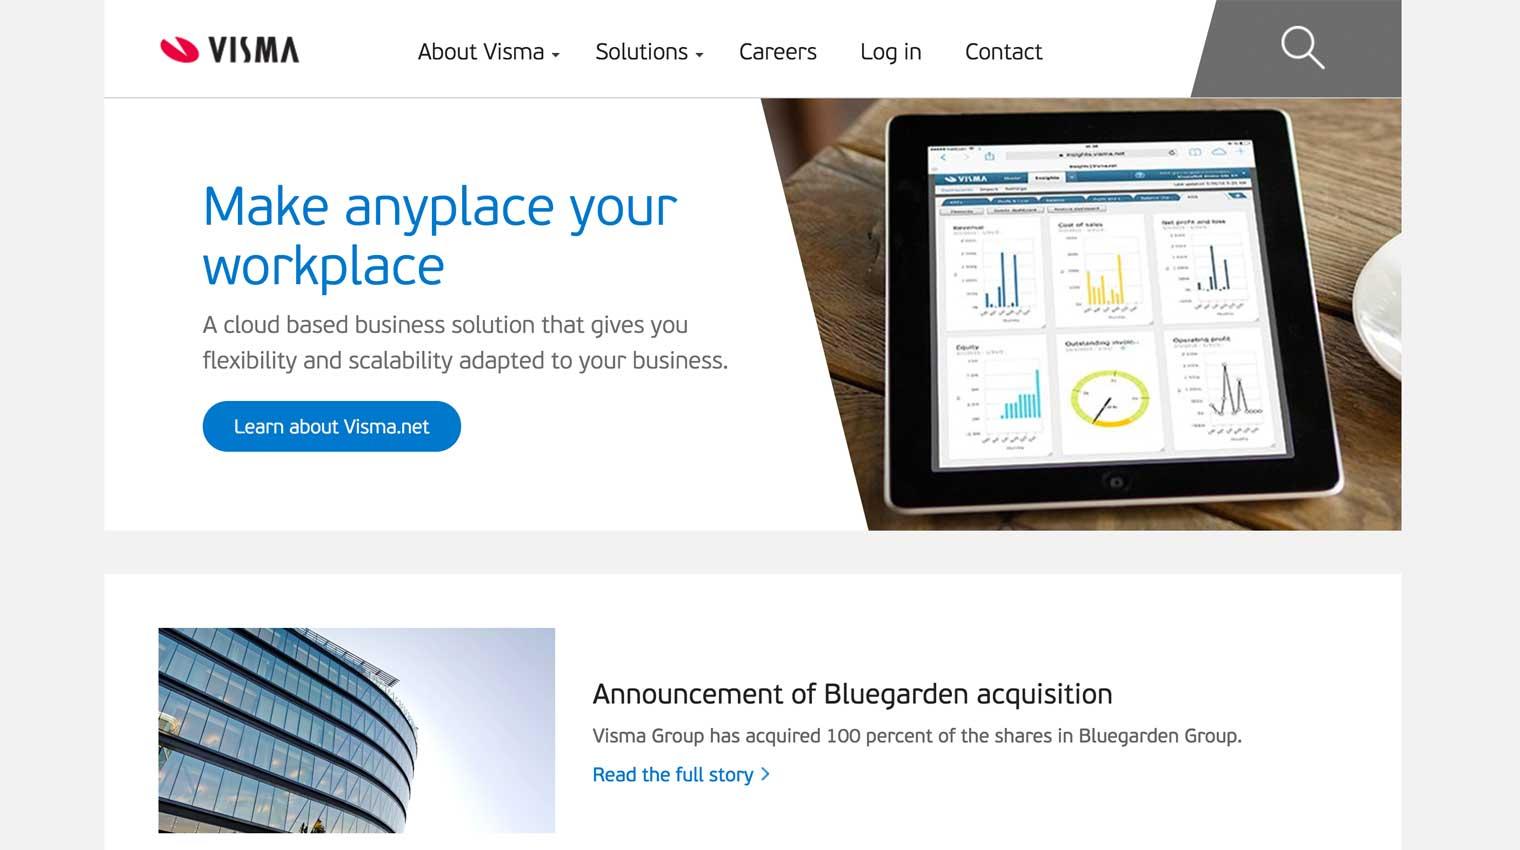 Visma home page